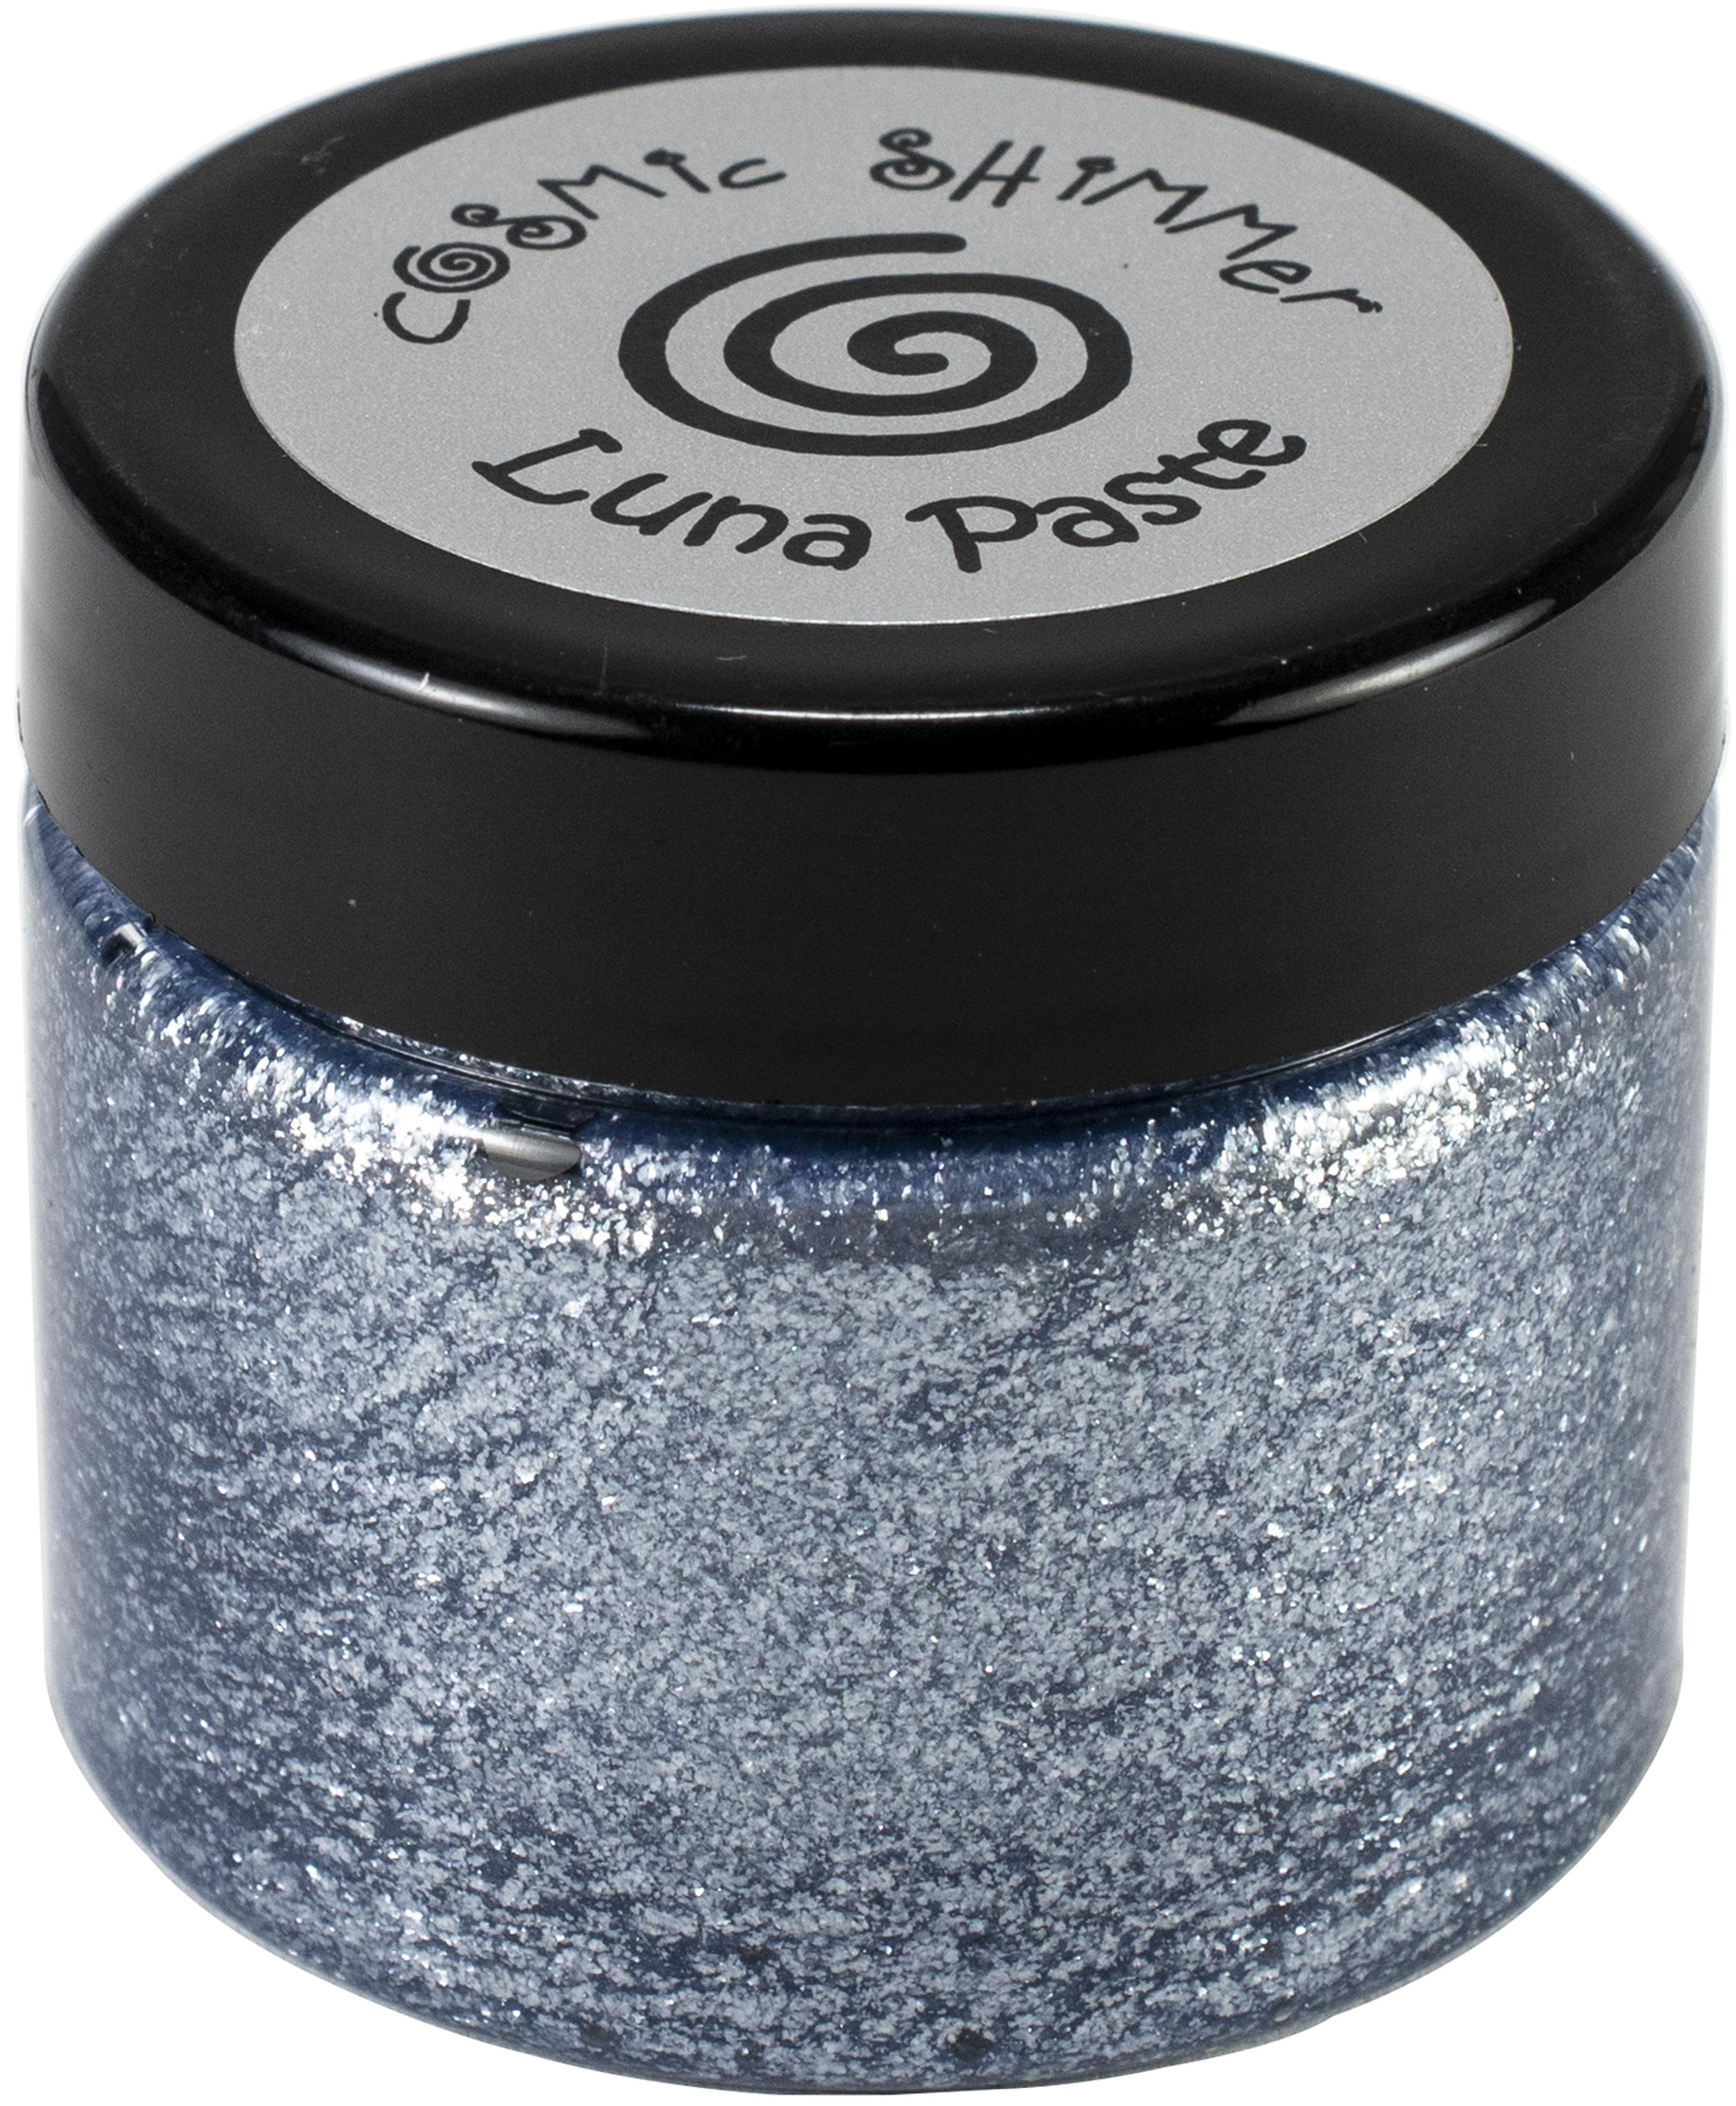 Cosmic Shimmer Luna Paste-Moonlight Storm